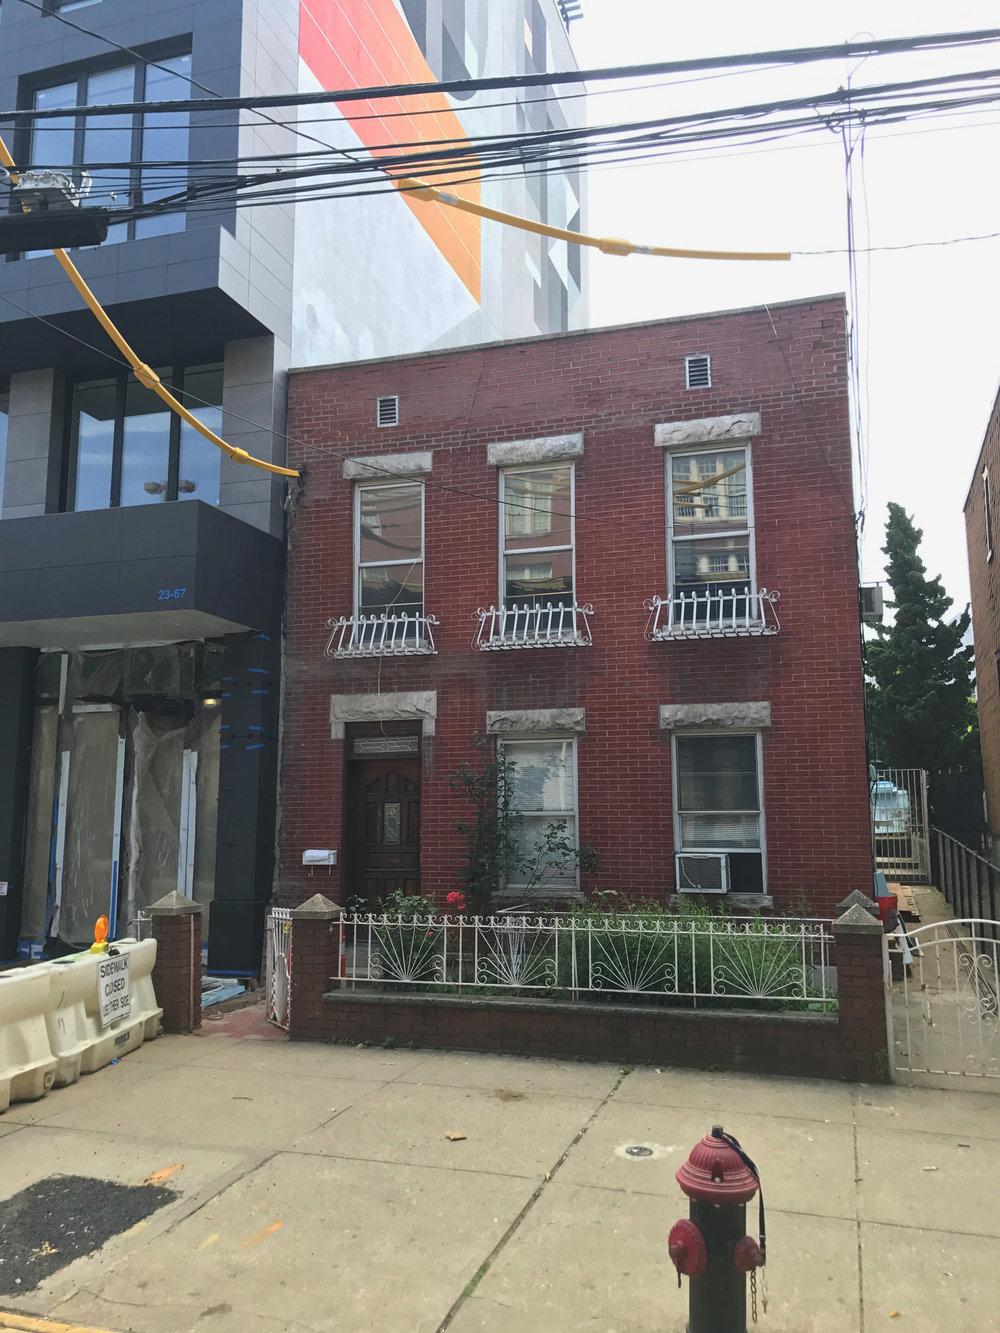 23-71 31st Street - Existing Building.jpg